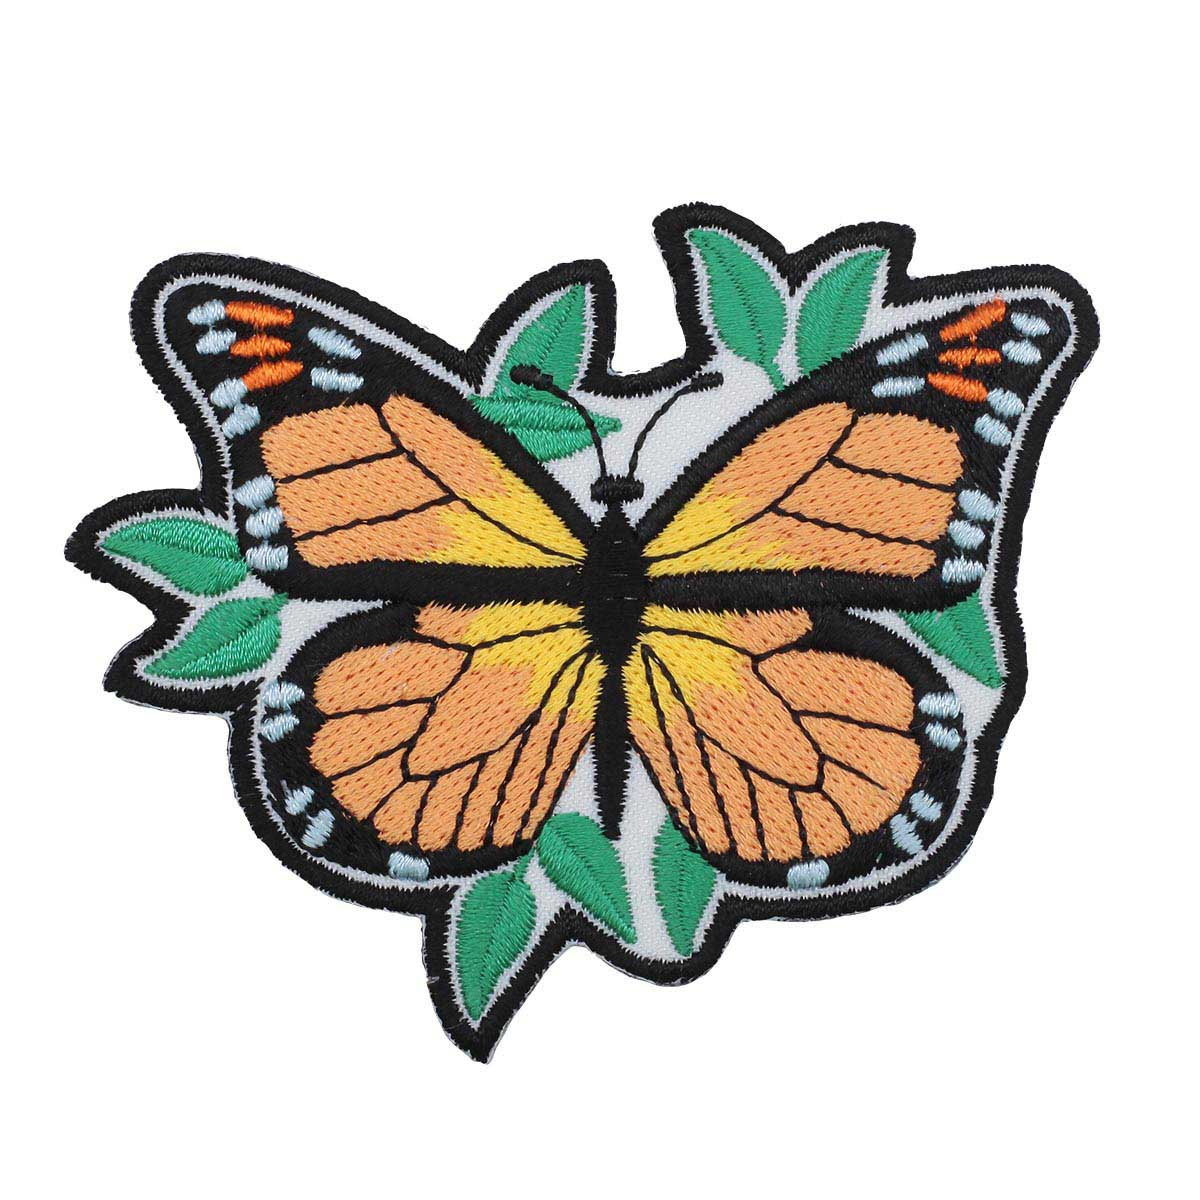 Термоаппликация 'Бабочка Монарх' 6,5*8,5см Hobby&Pro